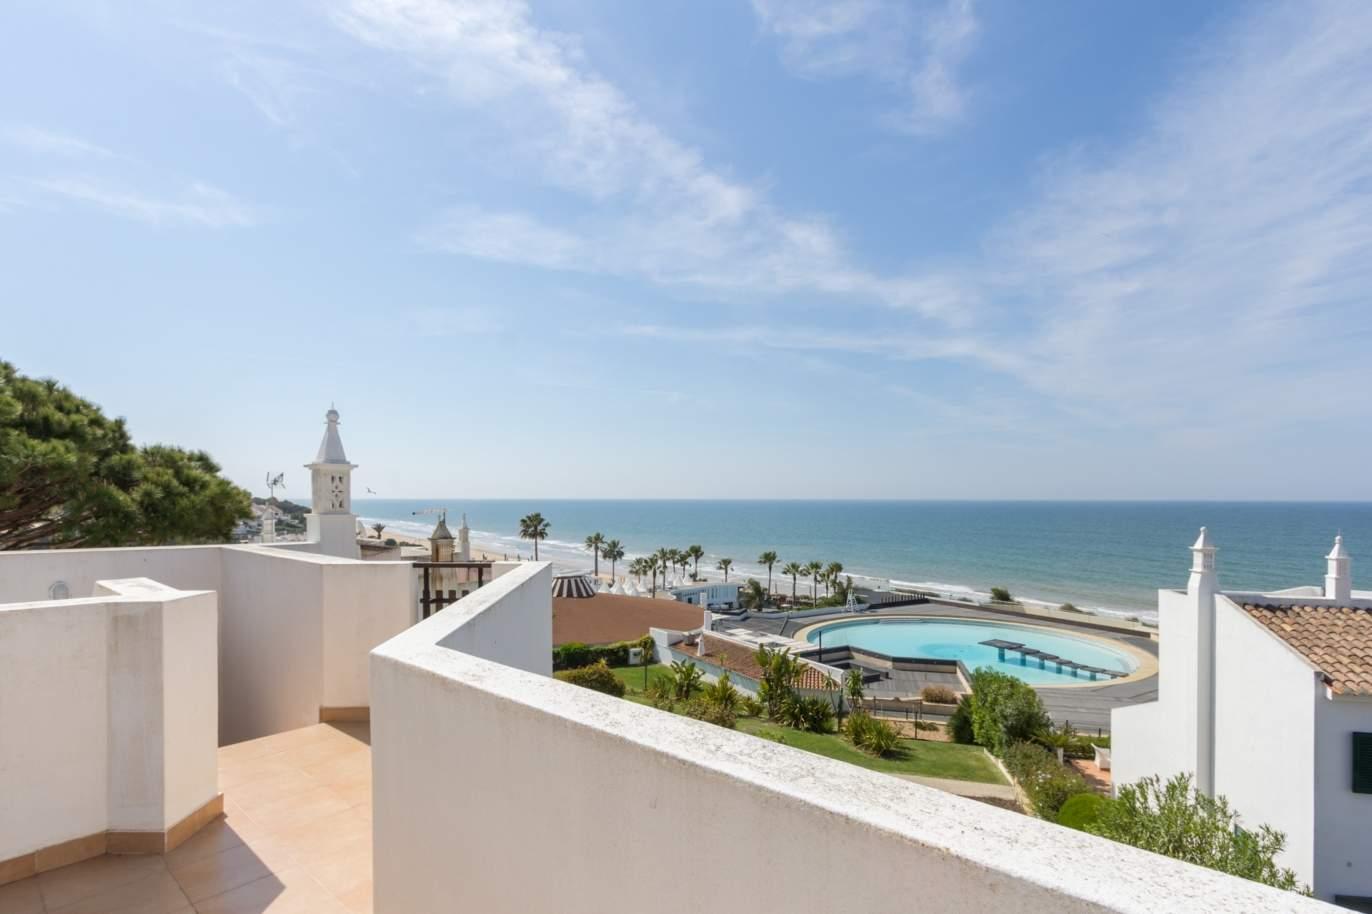 sale-of-villa-with-sea-view-in-vale-do-lobo-algarve-portugal